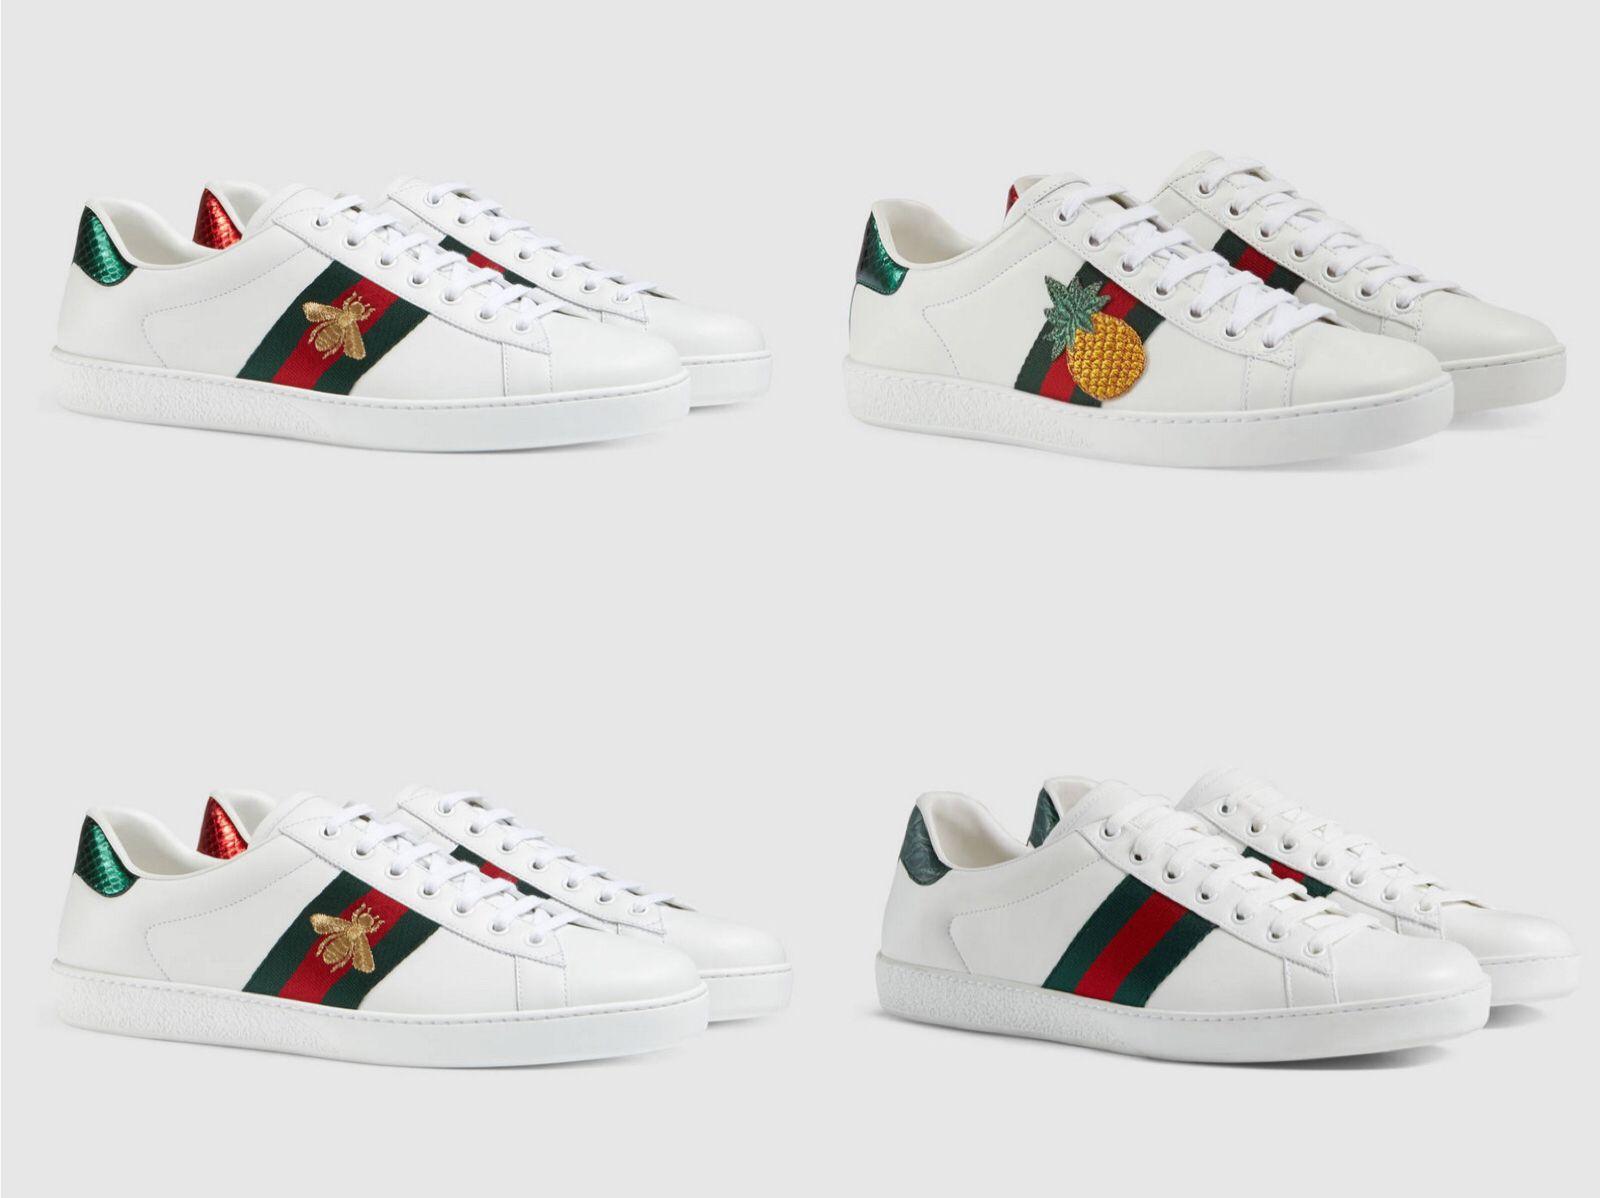 88e0c4d47e1dd6 Acquista ACE Sneakers Bee A Righe Ricamate Love Uomo Scarpe Da Donna  Original Luxury Brand Scarpe Casual In Vera Pelle Scarpe Da Ginnastica Di  Alta Qualità ...